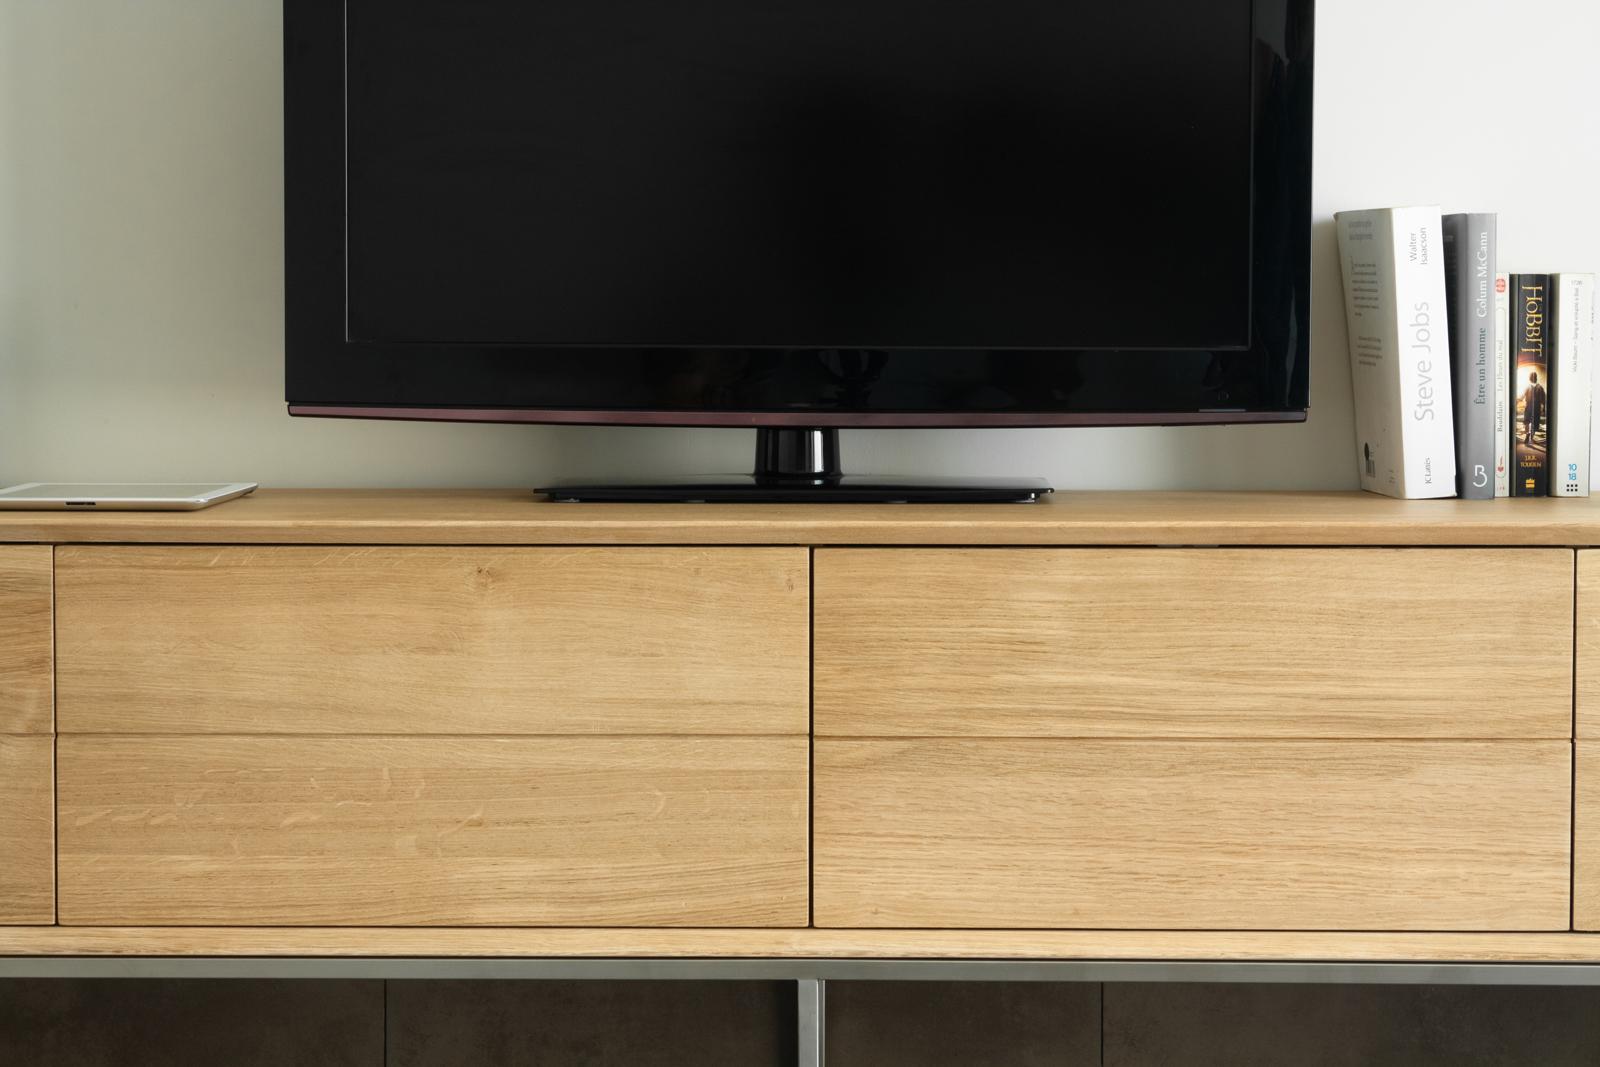 meuble tv en chene massif naturel 2 portes rabattables et 2 tiroirs 225x41x50cm kubico meubles tv pier import